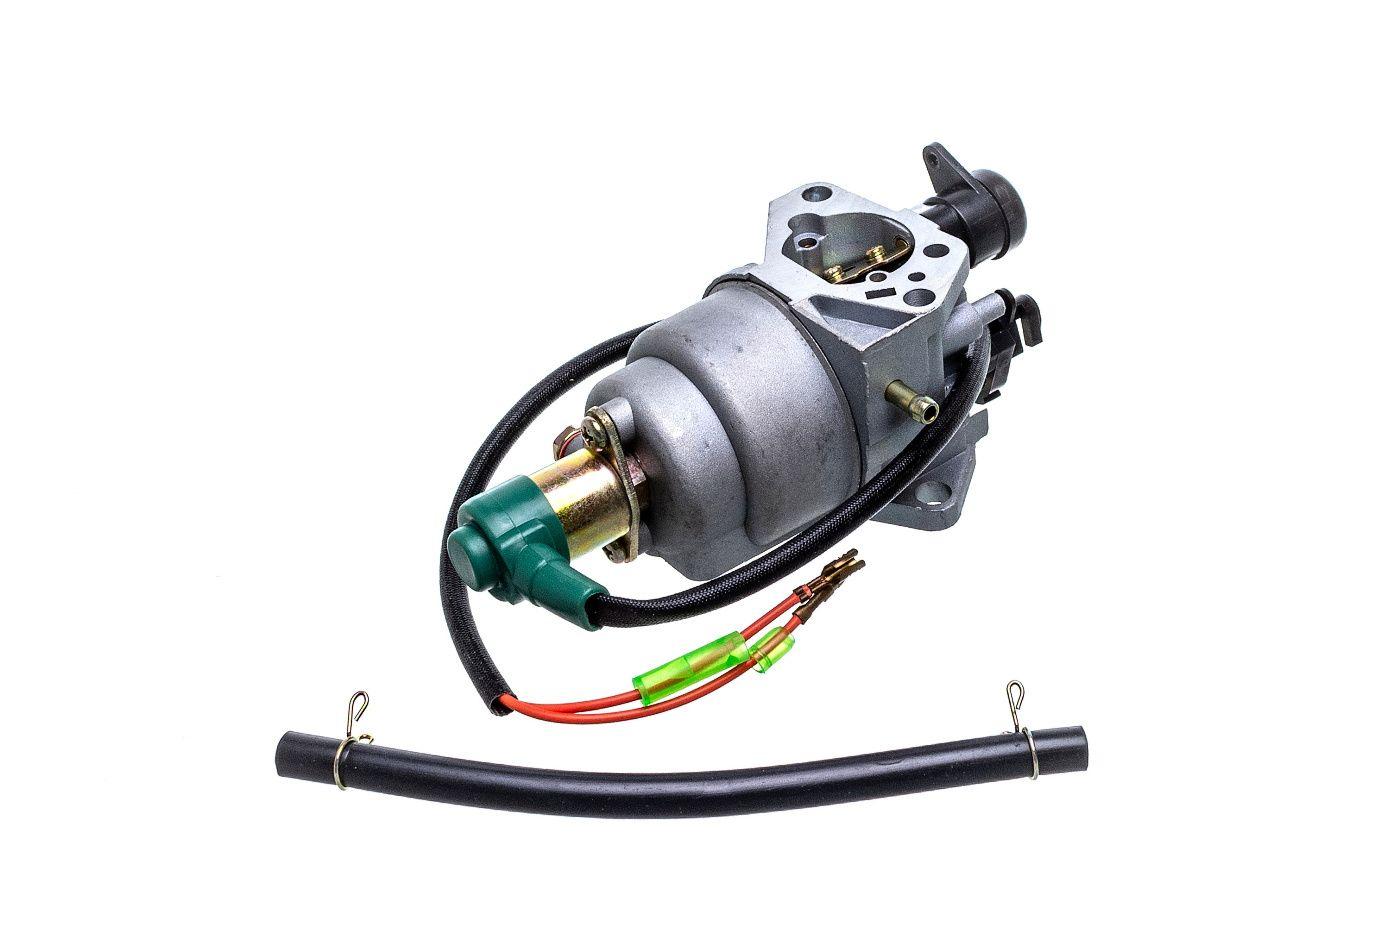 Karburátor pro generátor Honda GX340 11HP, GX390 13HP, 16100-Z5L-F11 SUPER AKCE